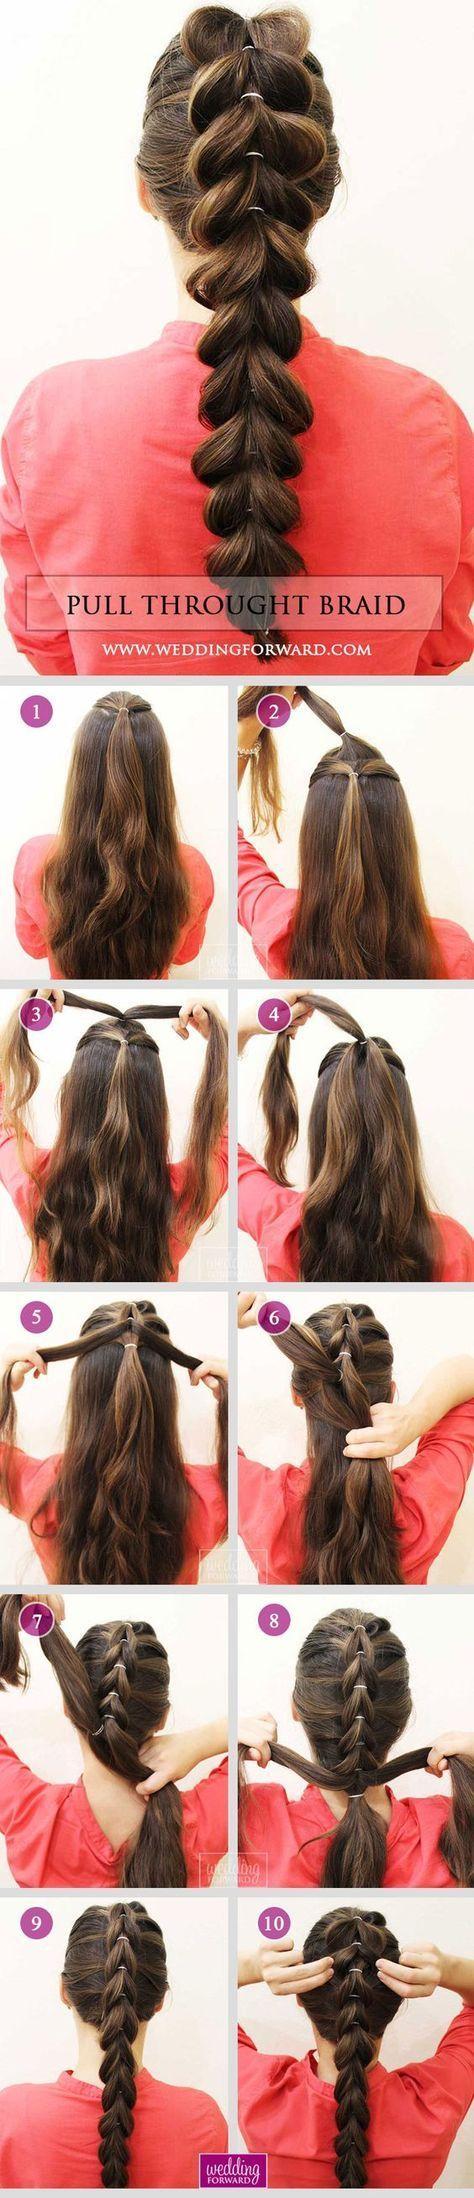 36 Braided Wedding Hair Ideas You Will Love❤ Stylish Pull Throught Braid at ho